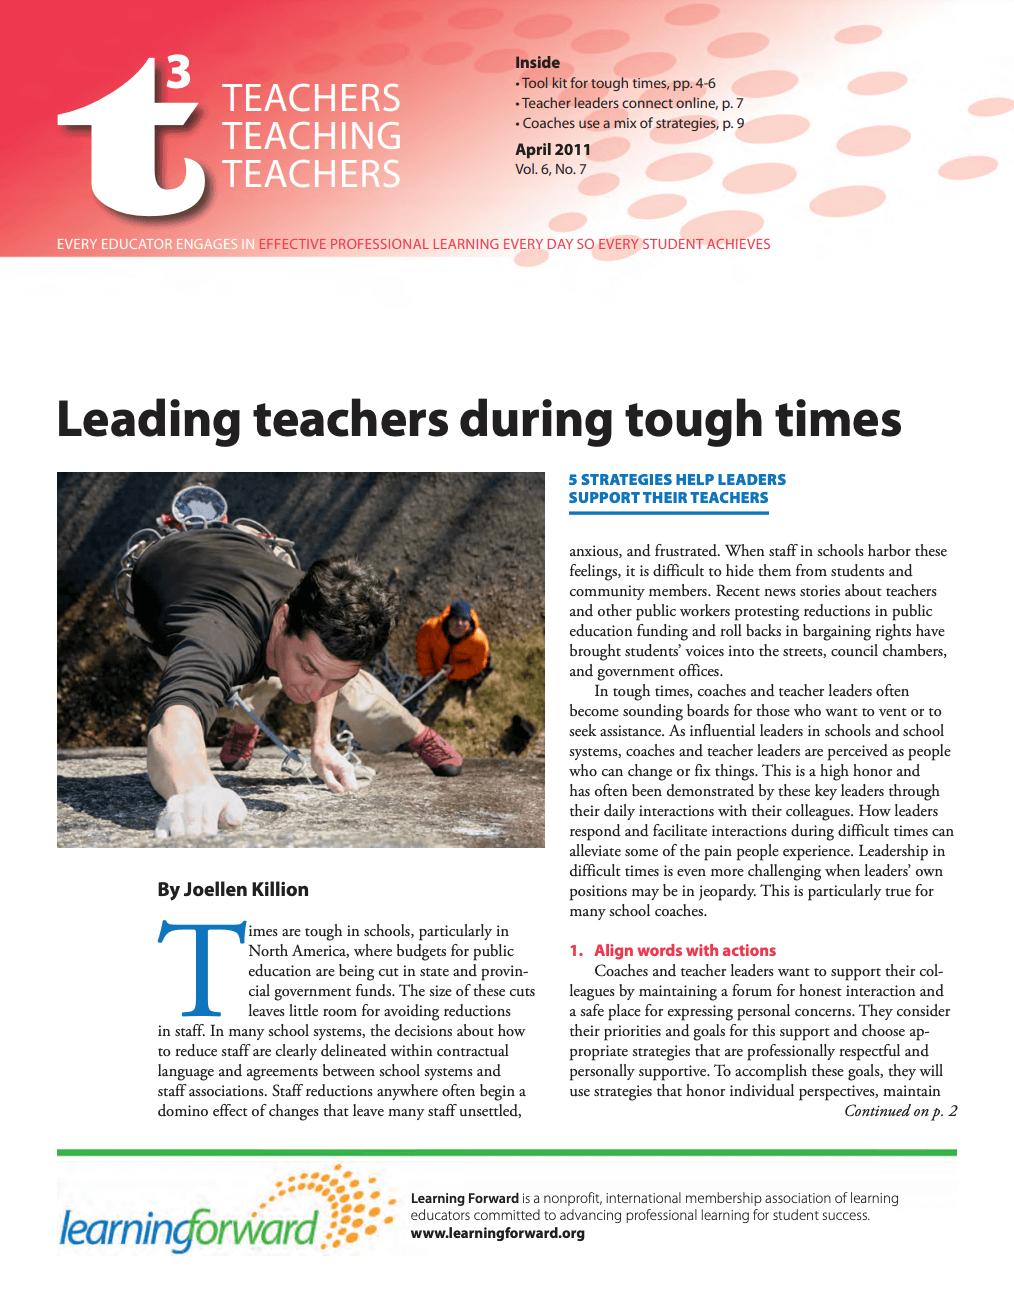 teacher-teaching-teachers-april-2011-vol-6-no-7